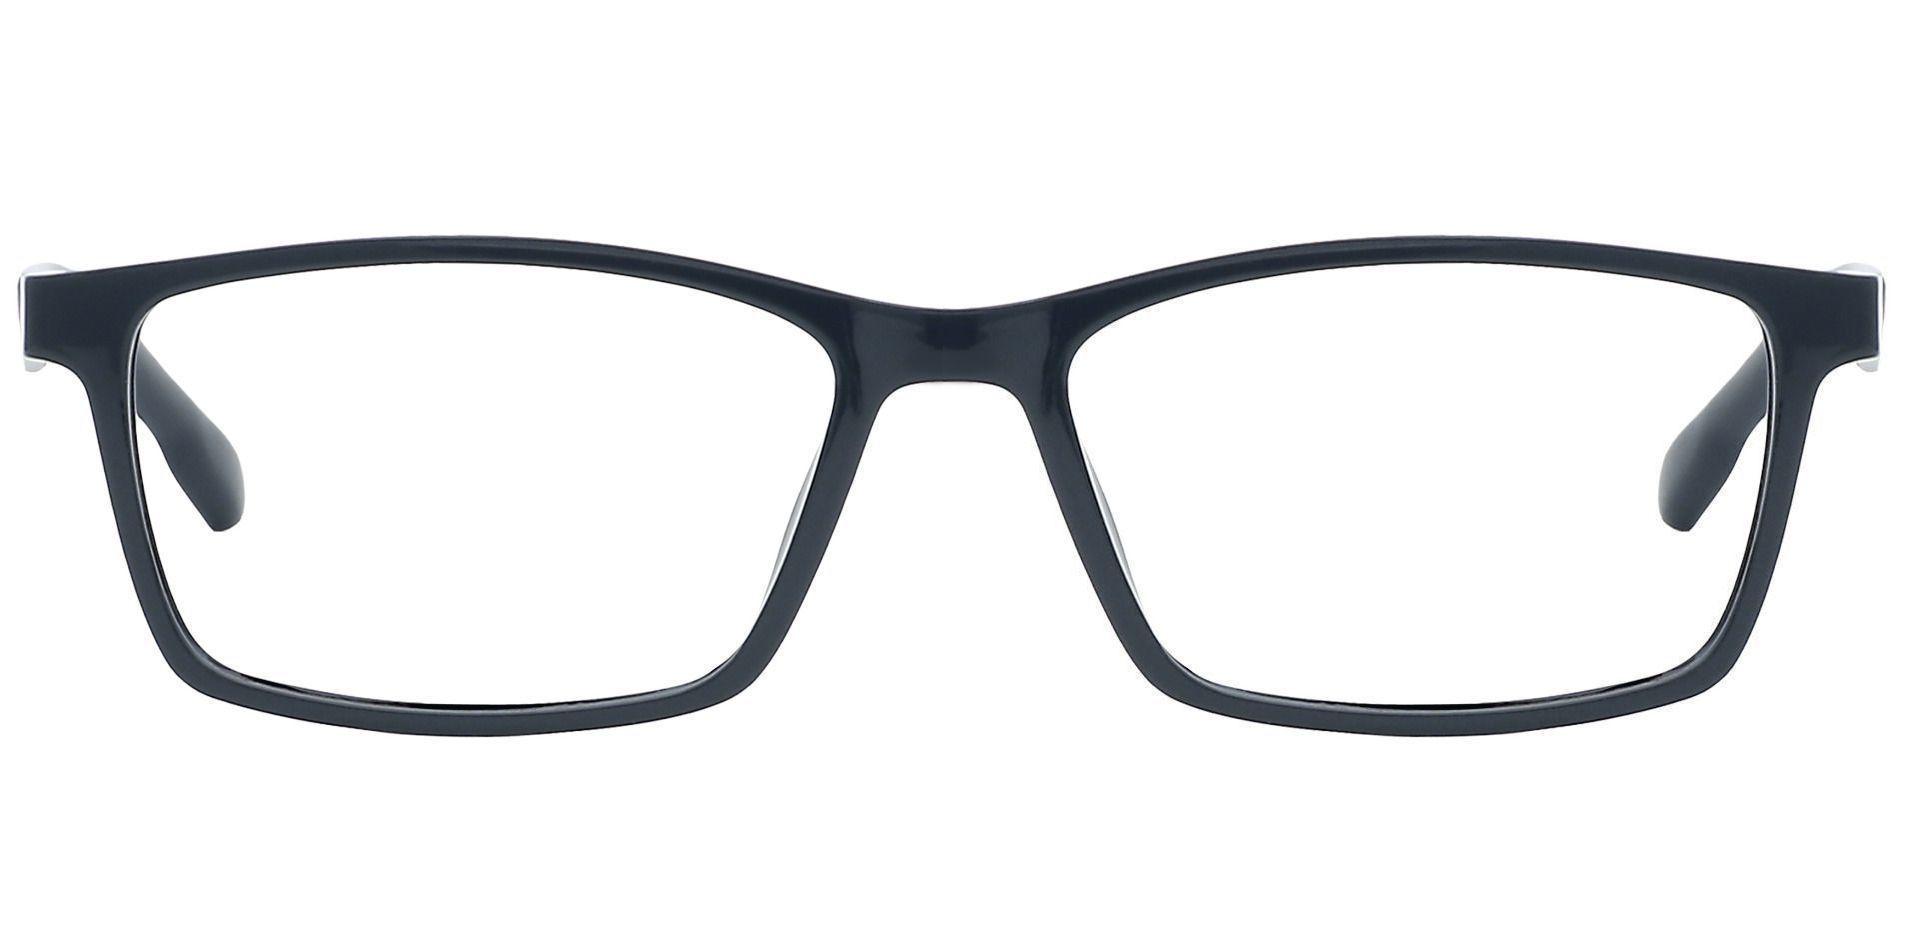 Veranda Rectangle Prescription Glasses - Black